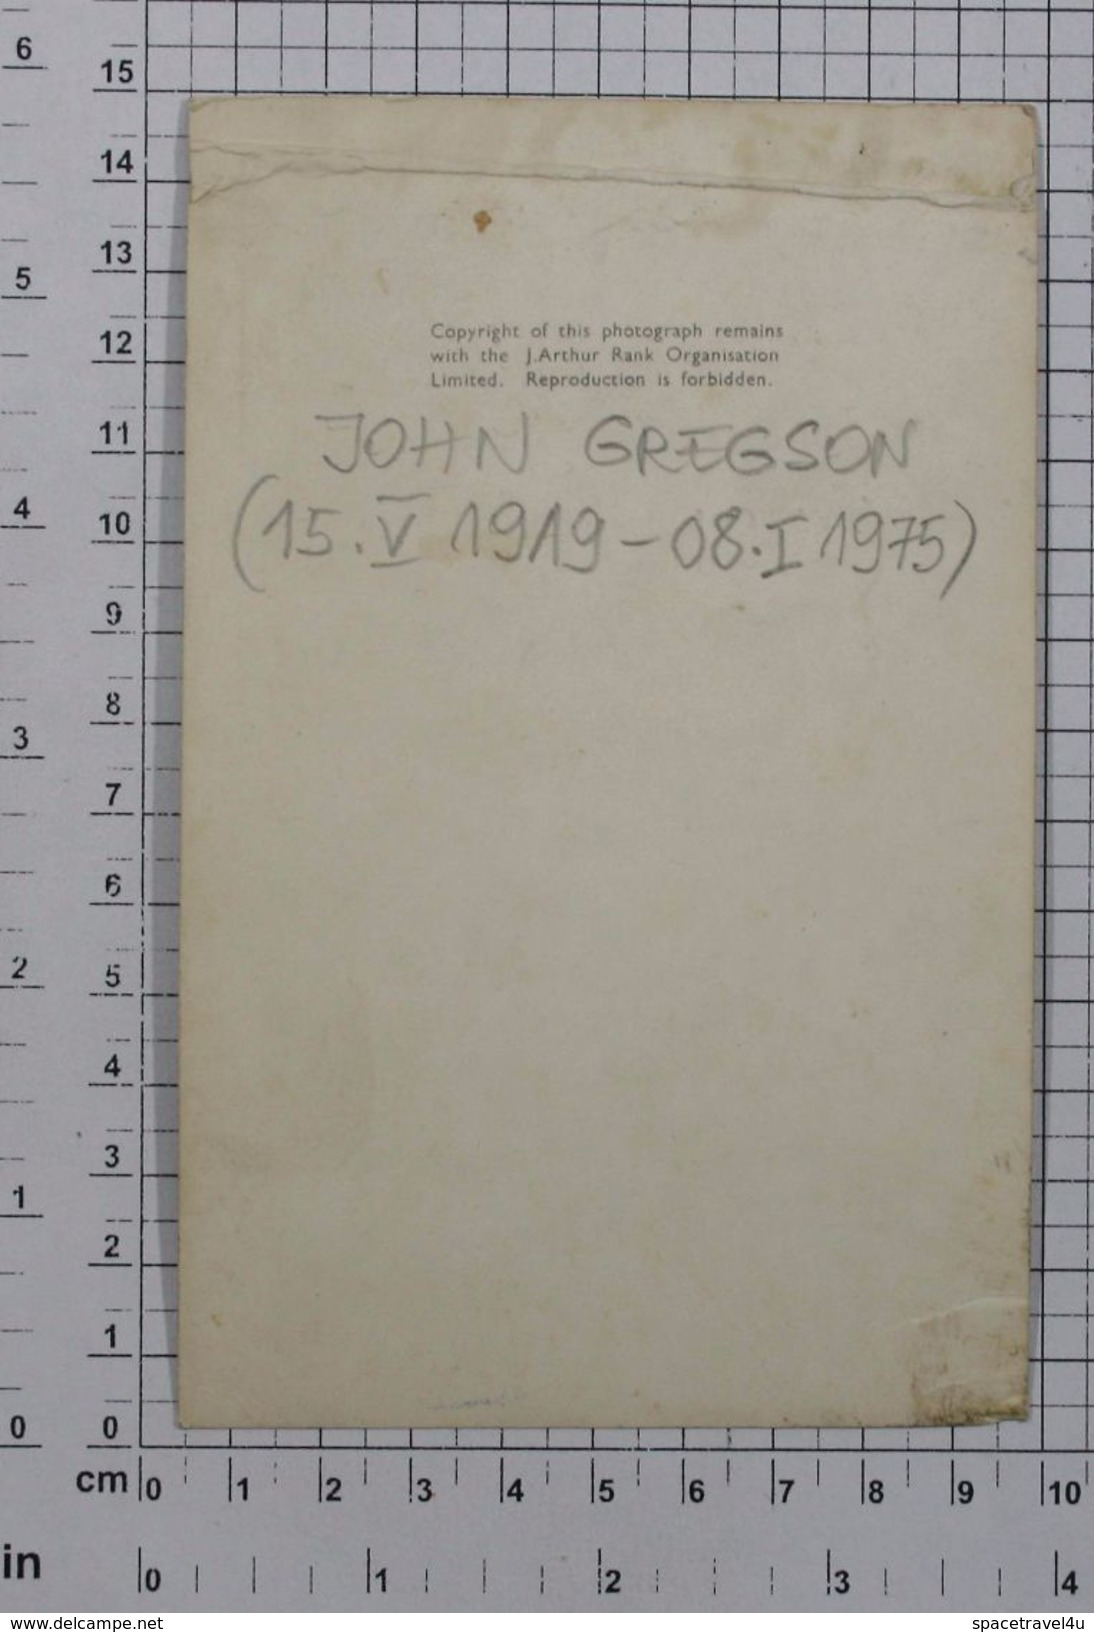 JOHN GREGSON - Vintage PHOTO Autograph REPRINT (AT-31) - Reproductions